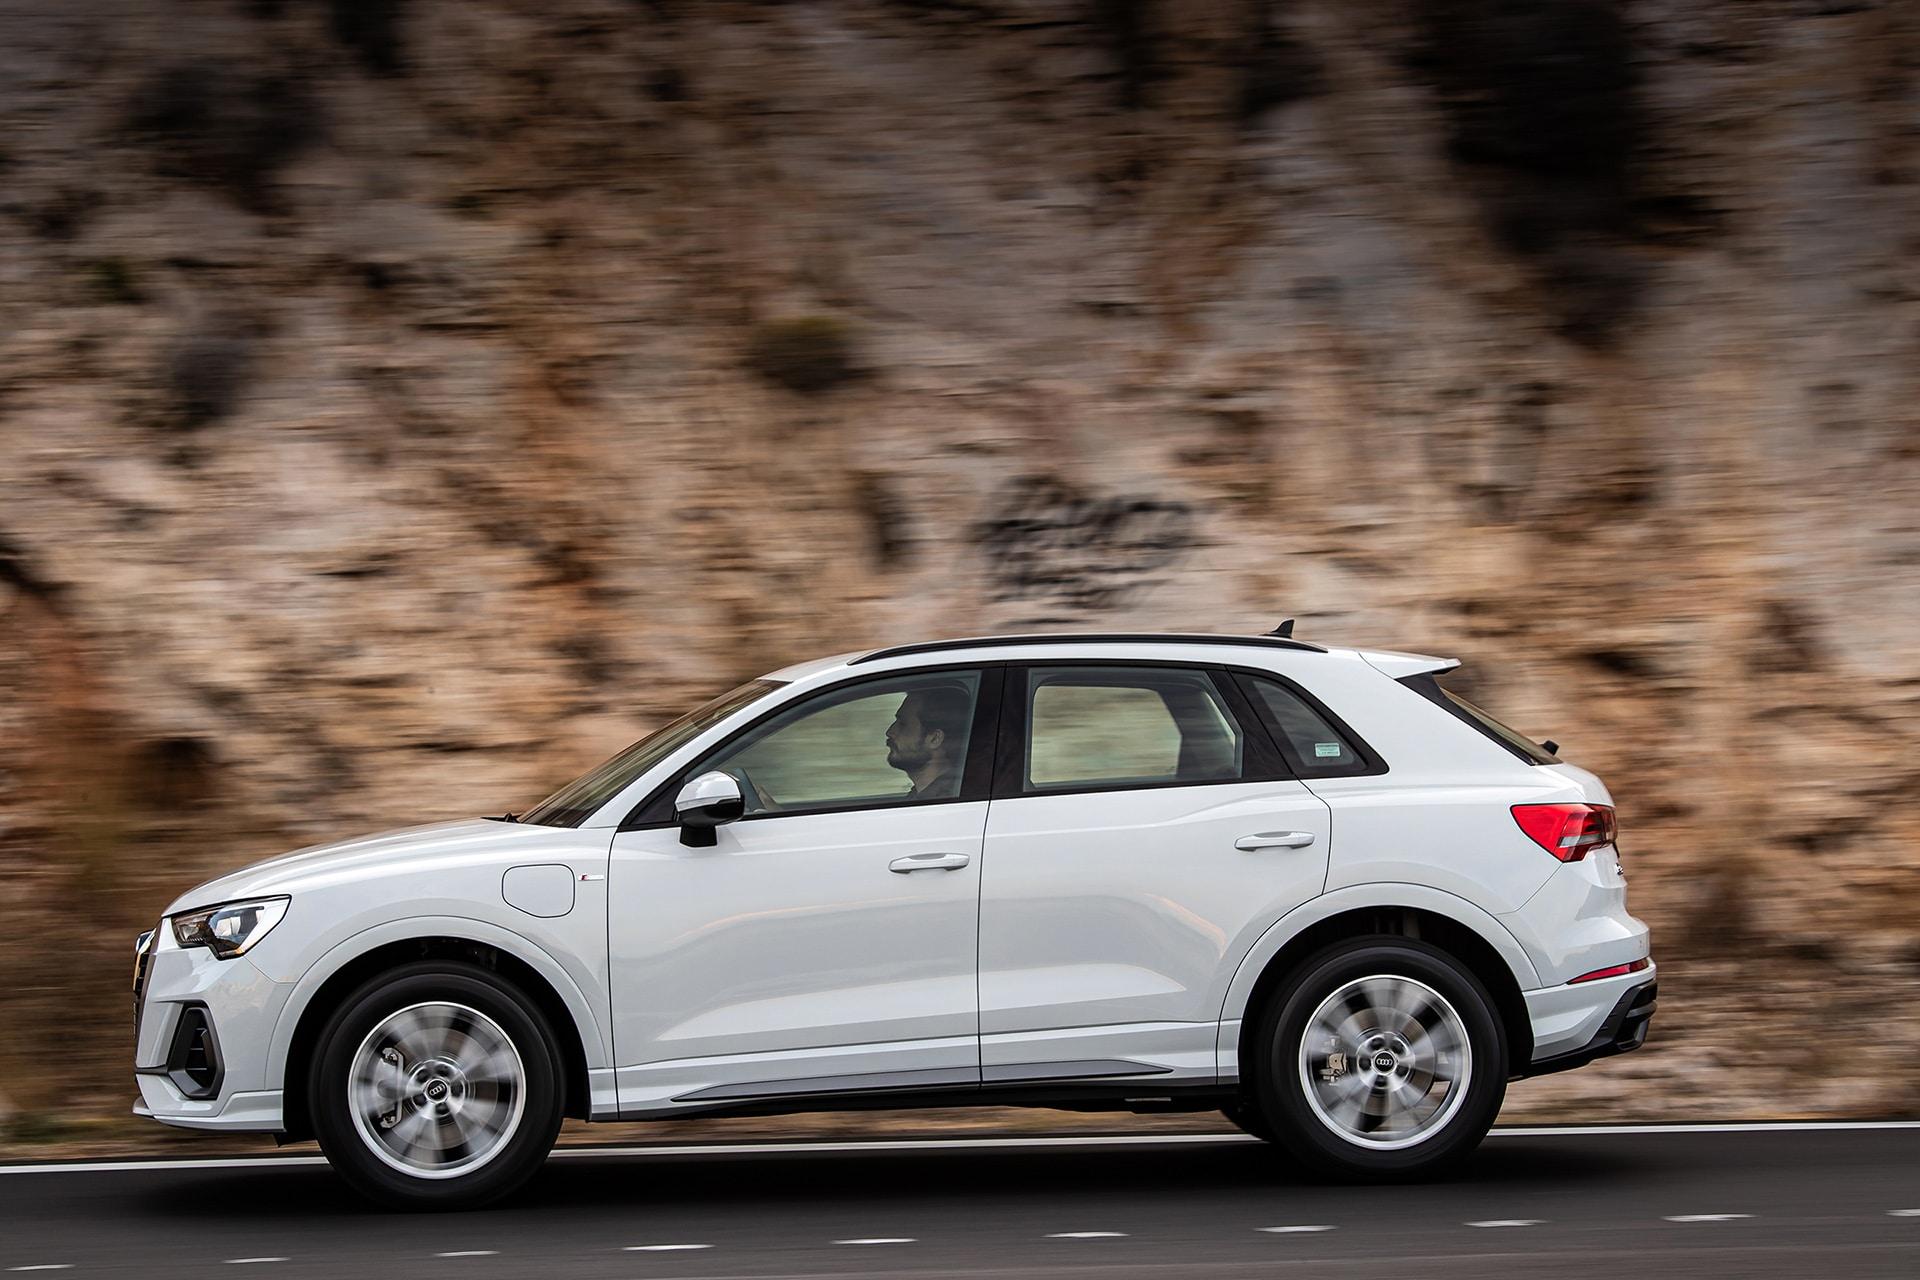 AUDI Q3 TFSI e 27 Αυτά είναι τα plug-in hybrid Audi Q3 TFSI e & Q3 Sportback TFSI e Audi, Audi Q3, Hybrid, plug-in hybrid, Q3, ειδήσεις, Νέα, υβριδικό